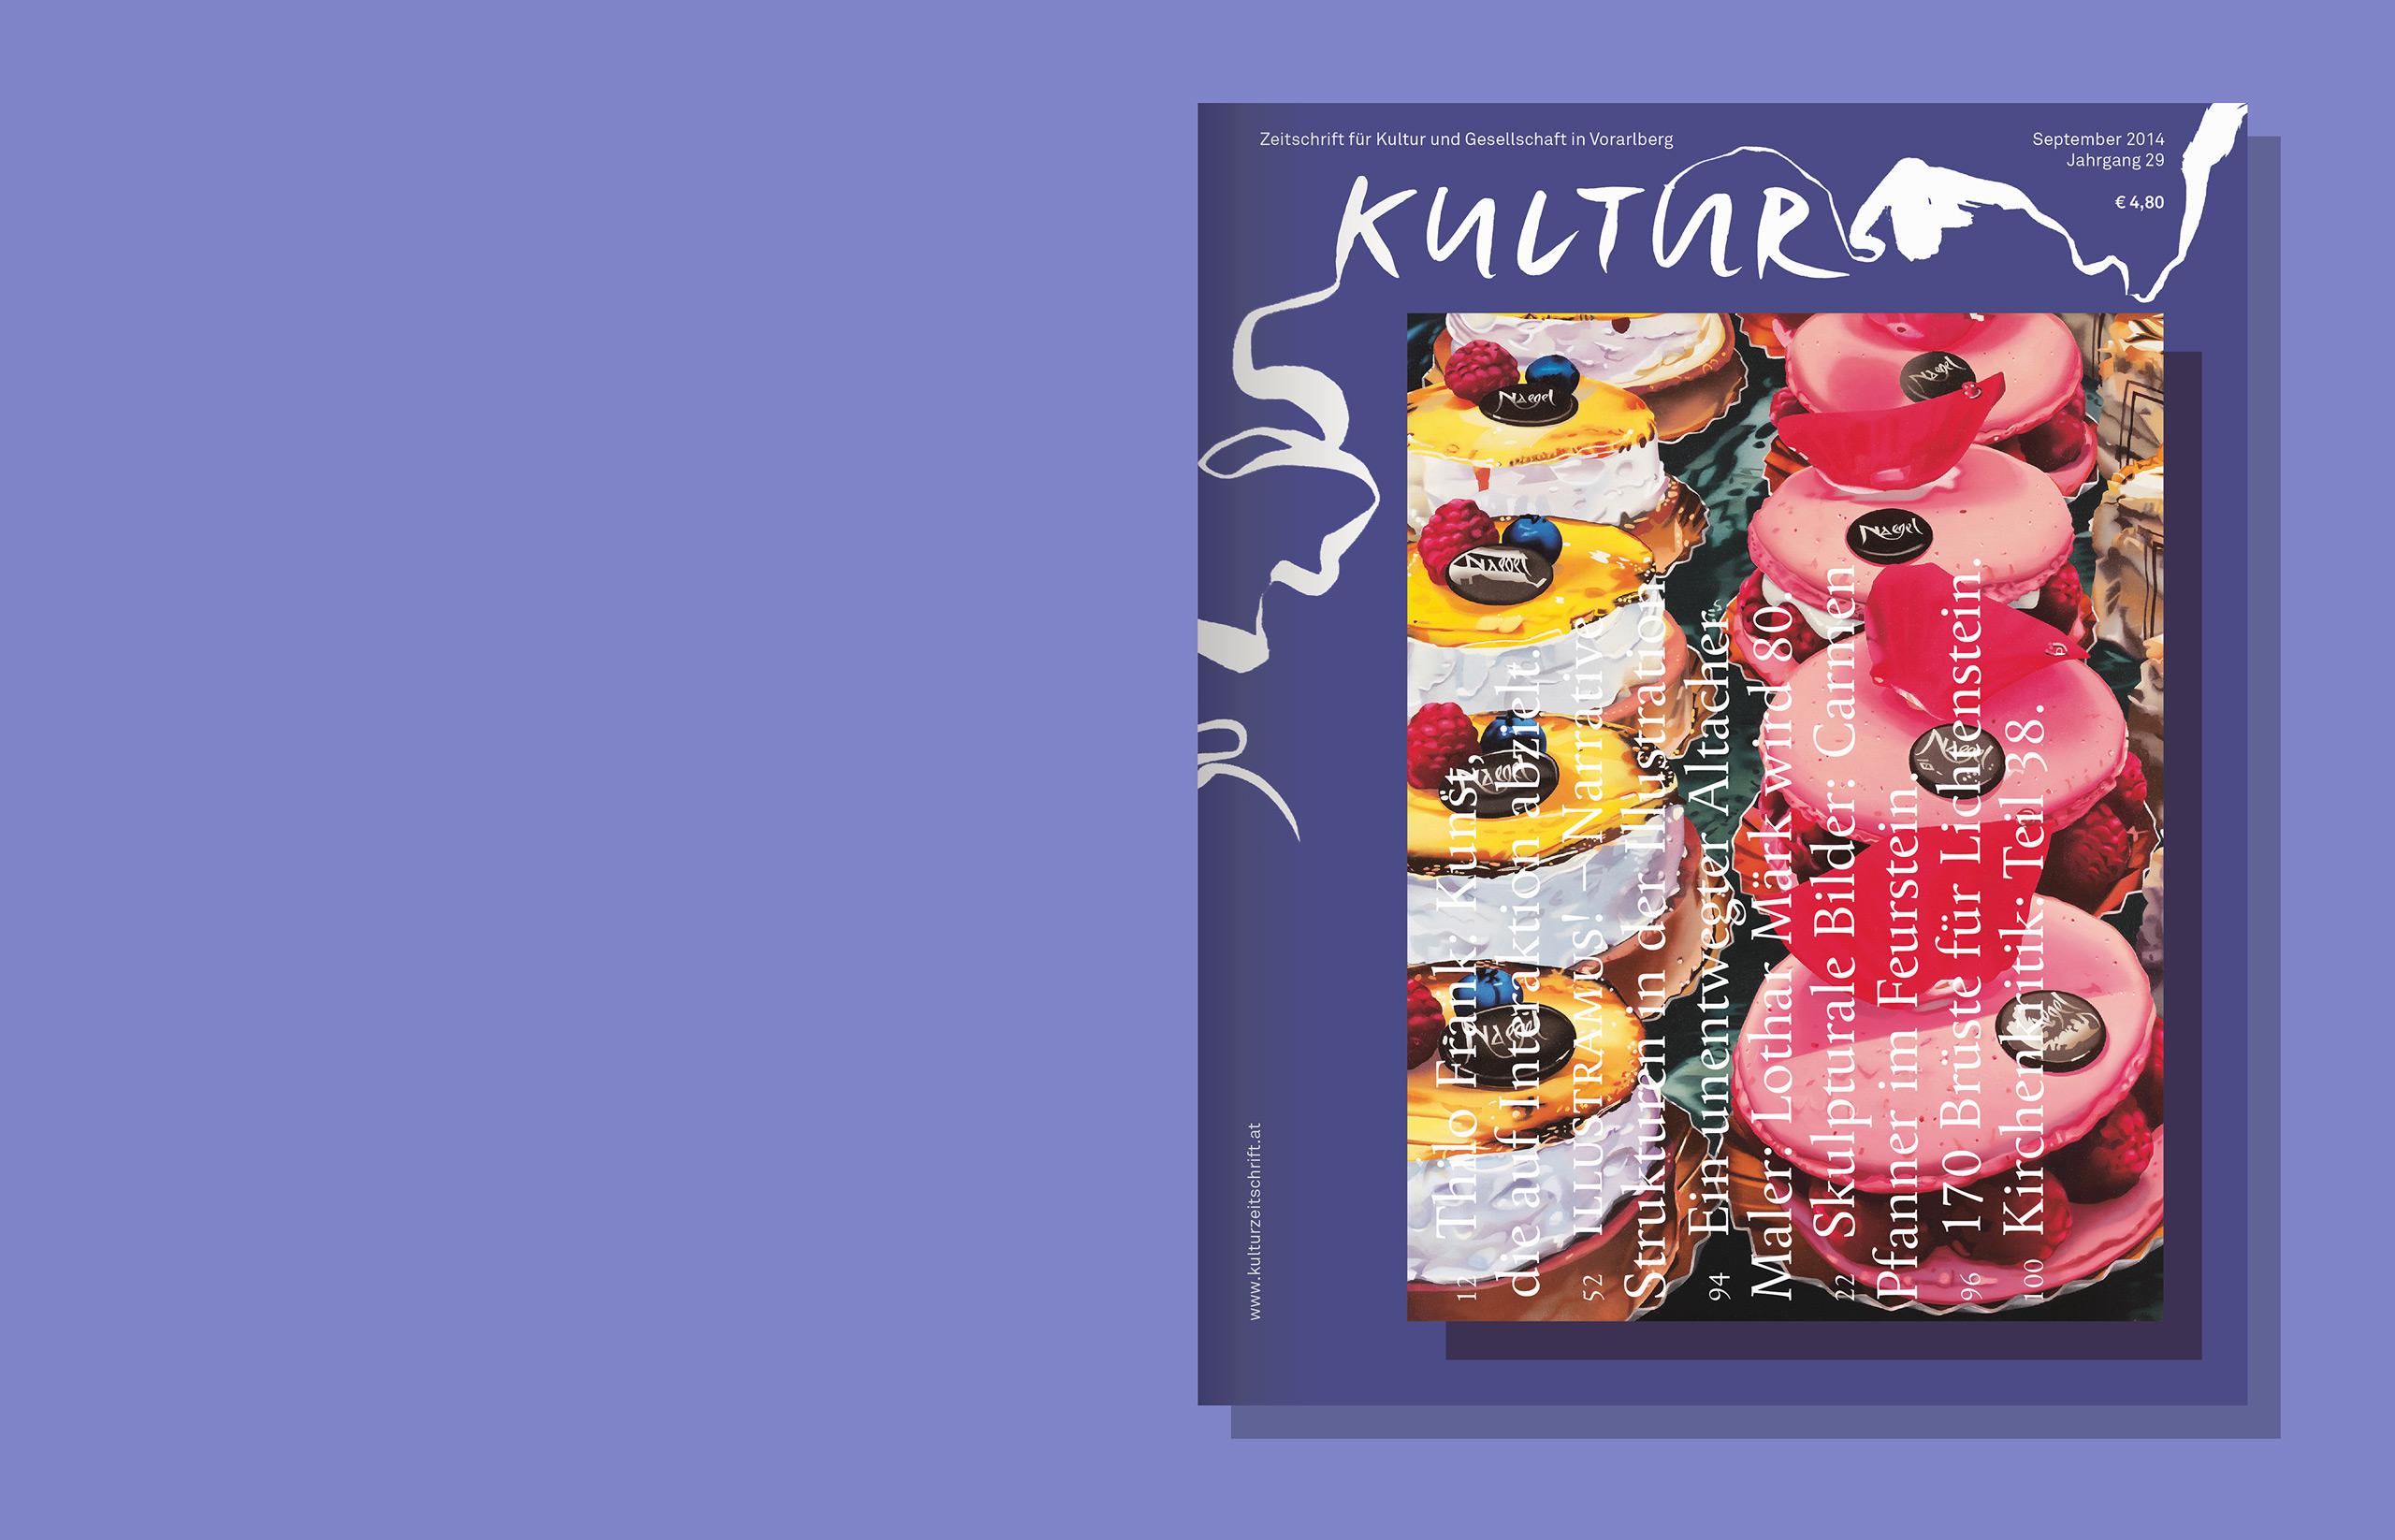 KULTUR_Zeitschrift_Redesign_Spitaler9